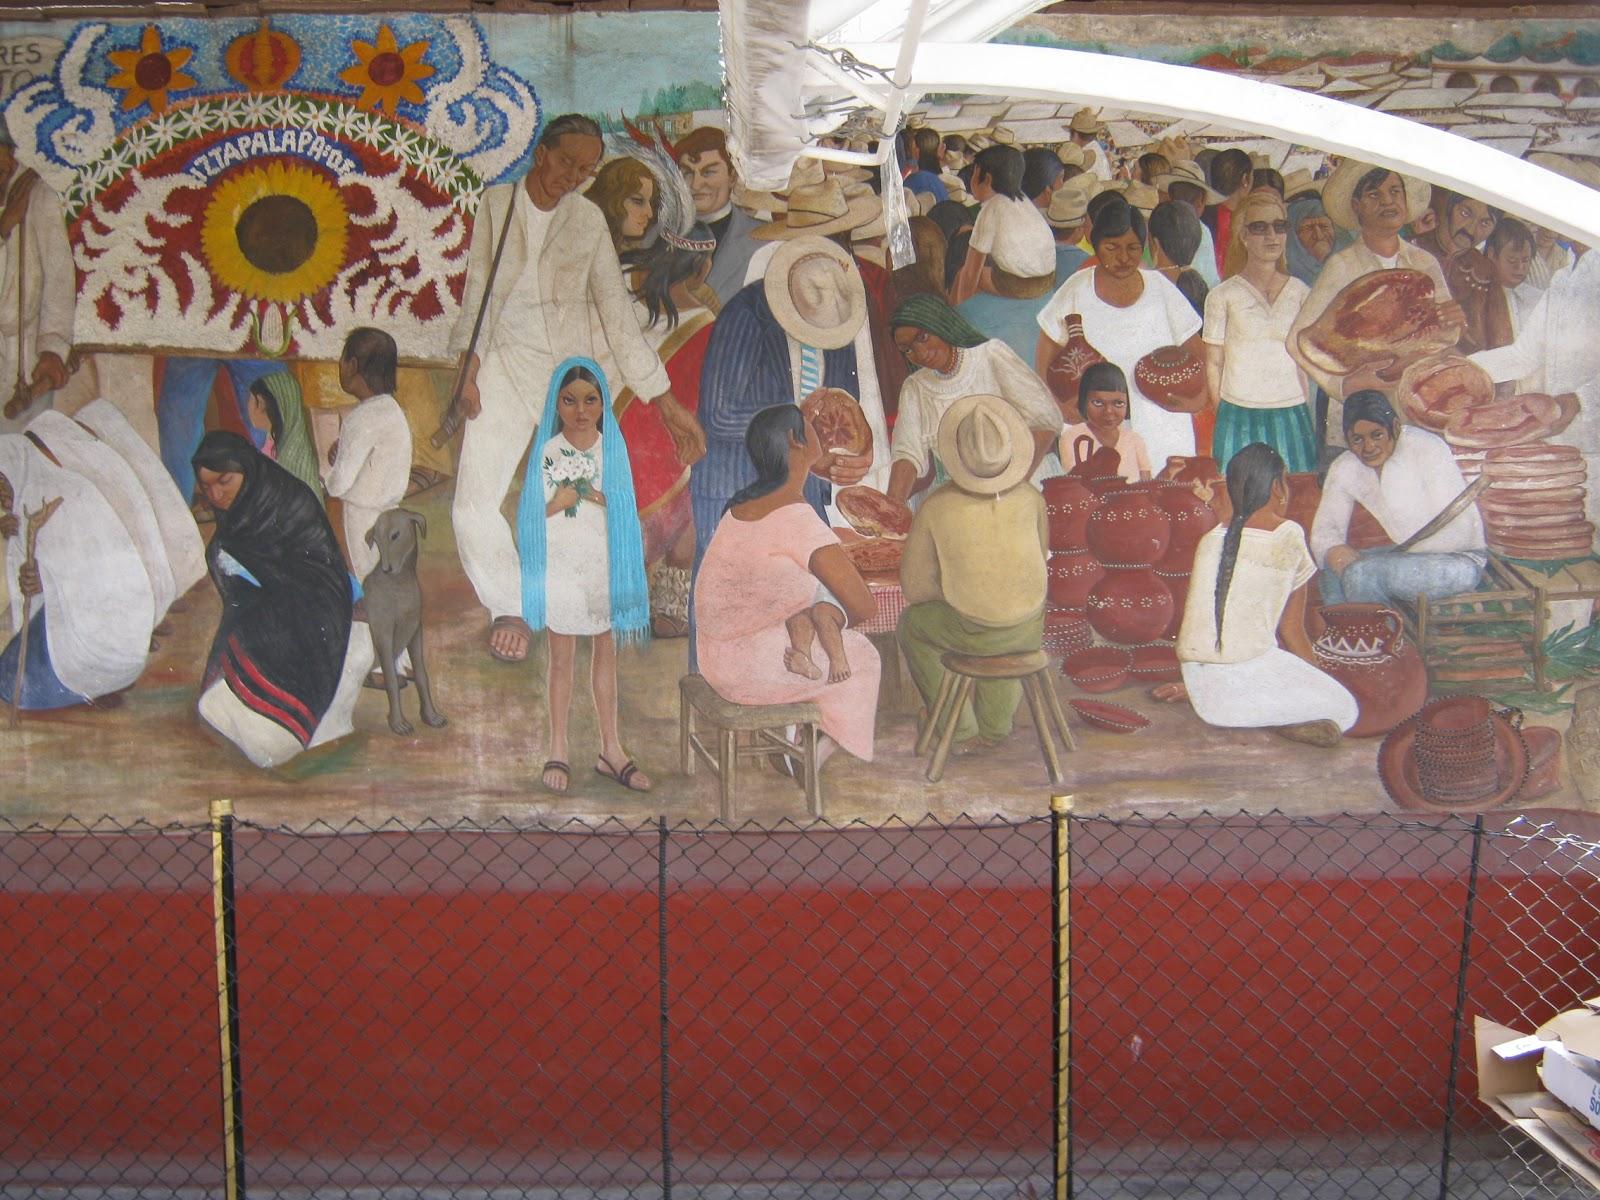 Autobiograf a de tlaltenango su historia contada por un mural for Caracteristicas de un mural